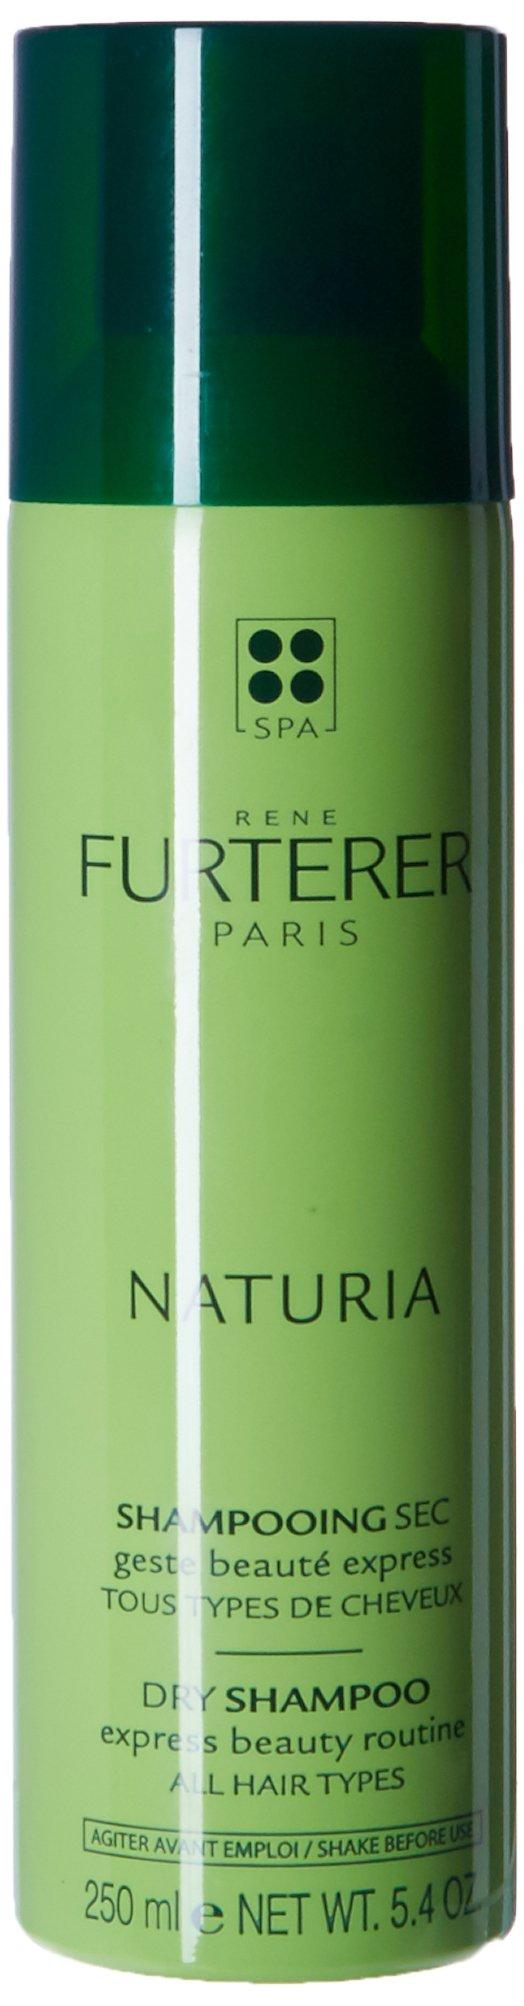 Rene Furterer NATURIA Dry Shampoo,  Oil-Absorbing, Clay, Beige Tint, Lightly Scented, 5.4 Fl Oz by Rene Furterer